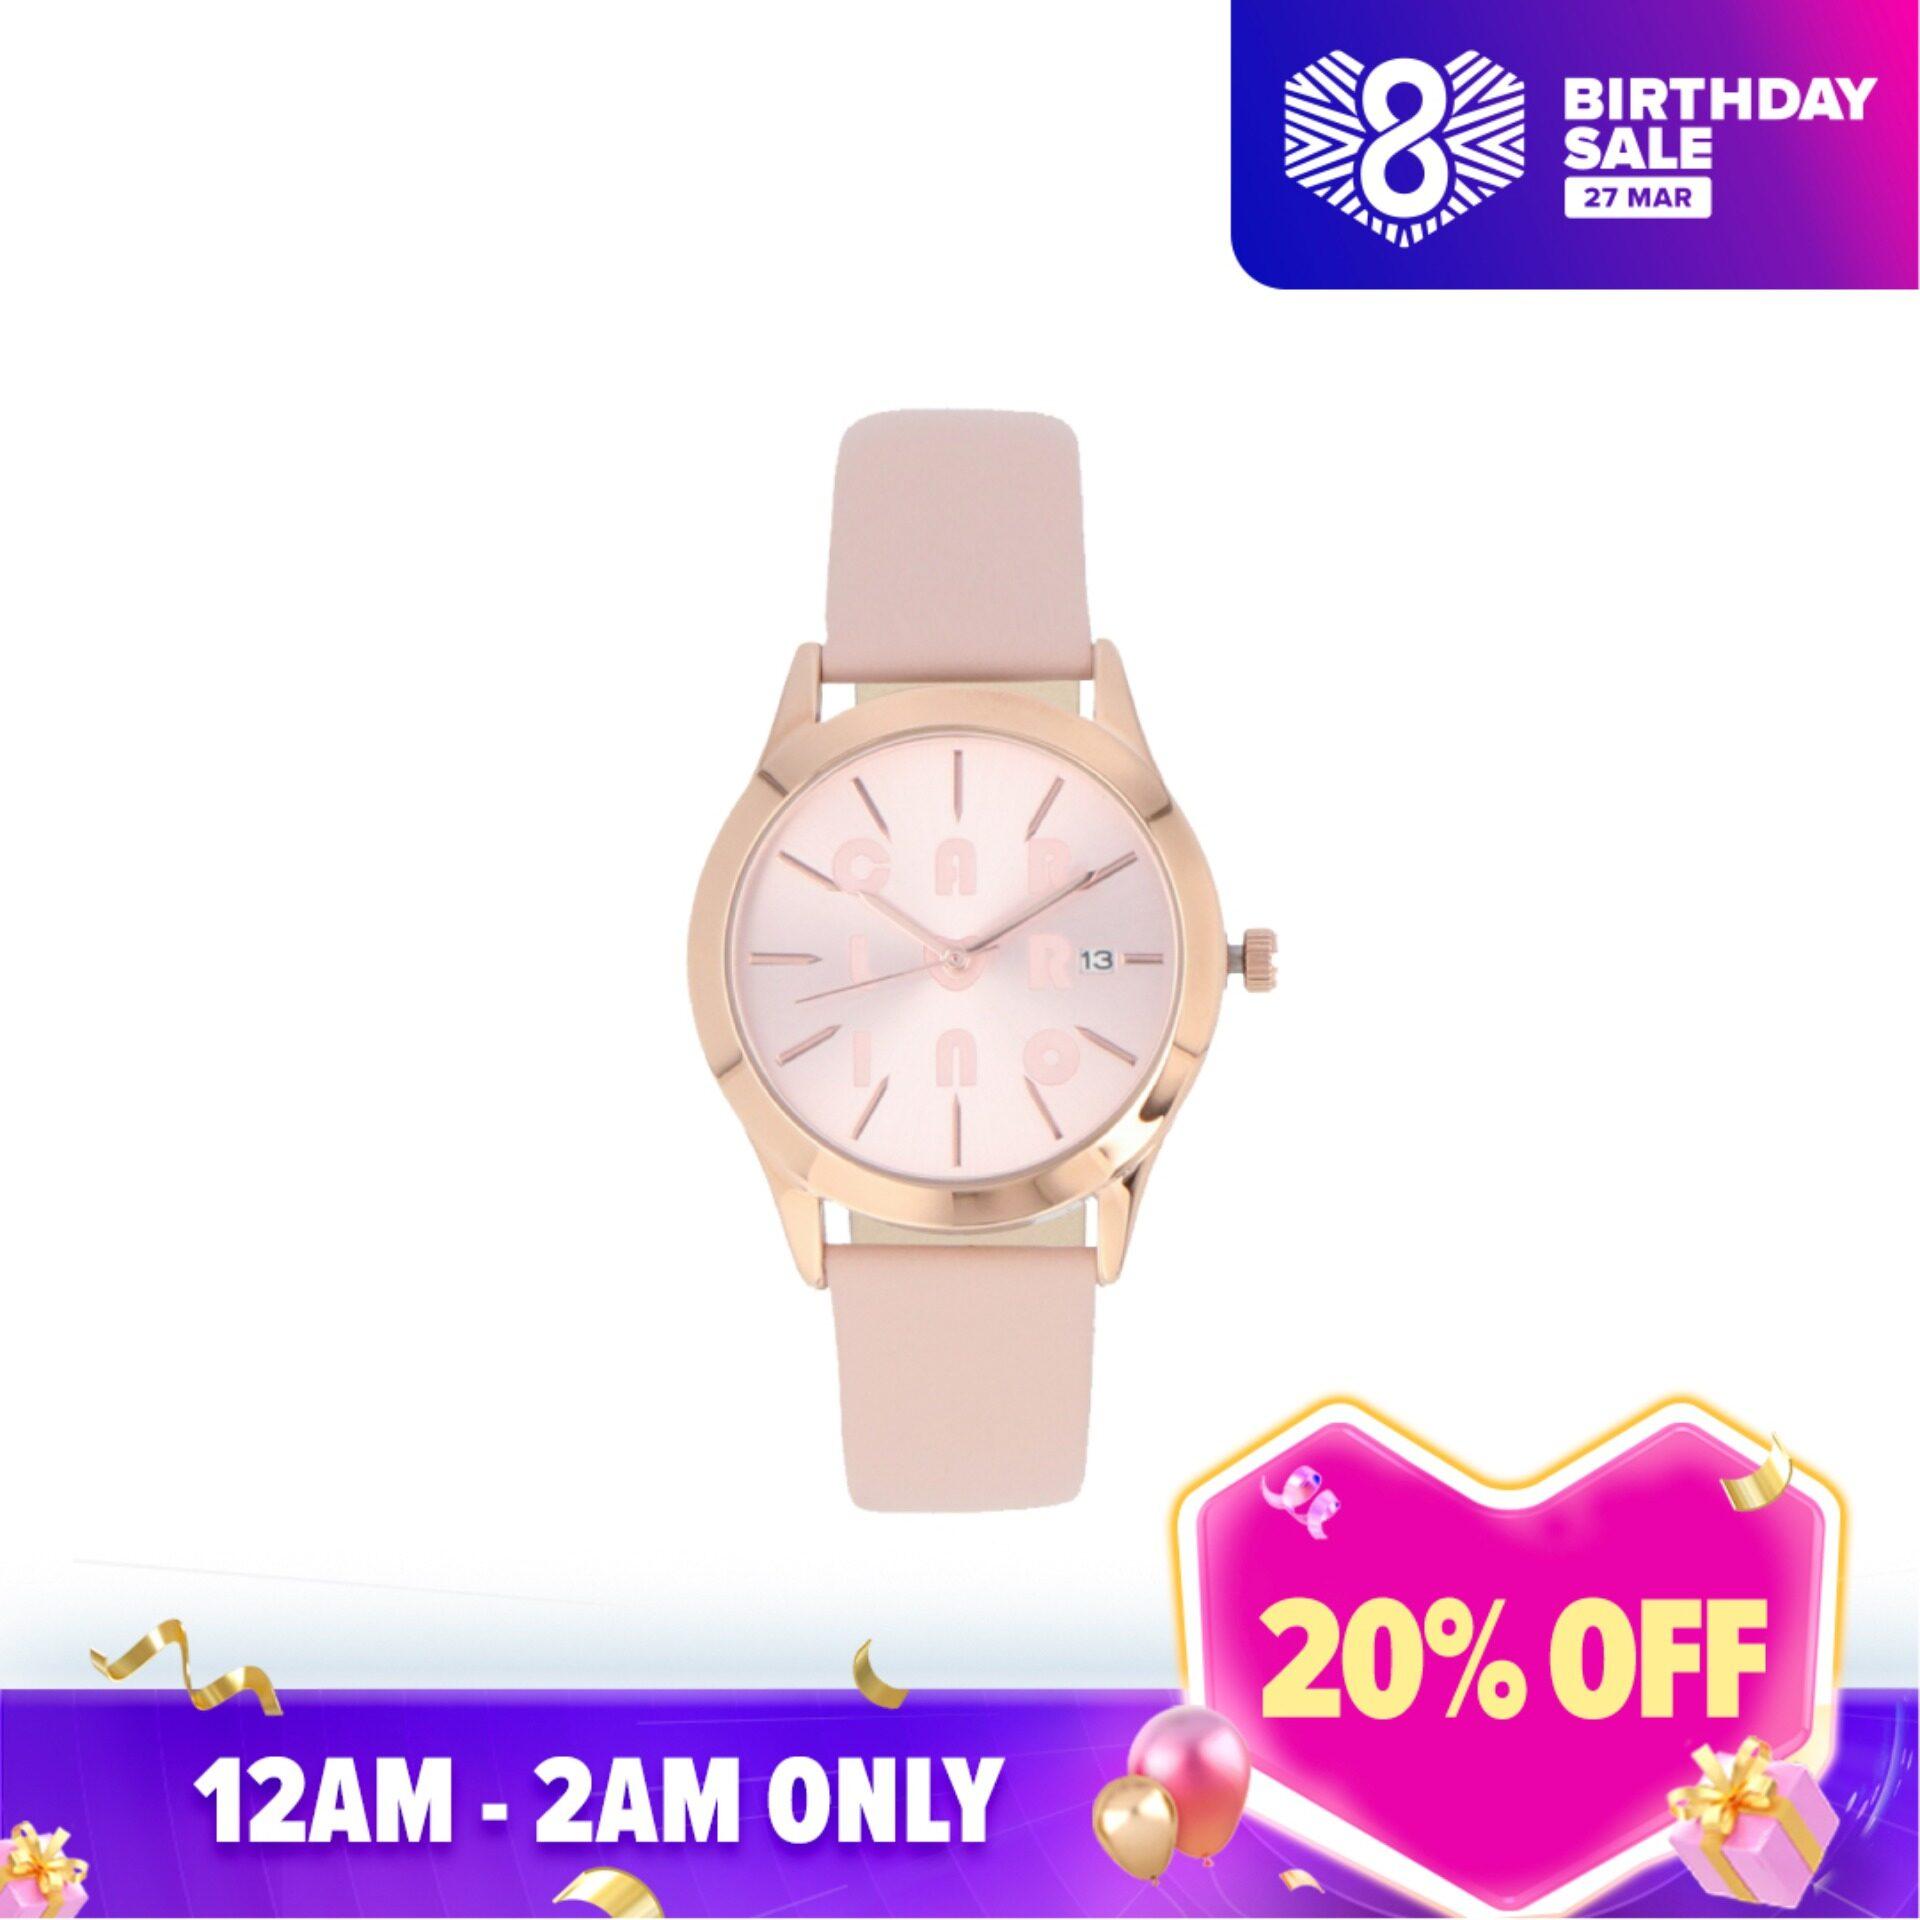 Carlo Rino Pink Styler Leather Strap Timepiece Malaysia